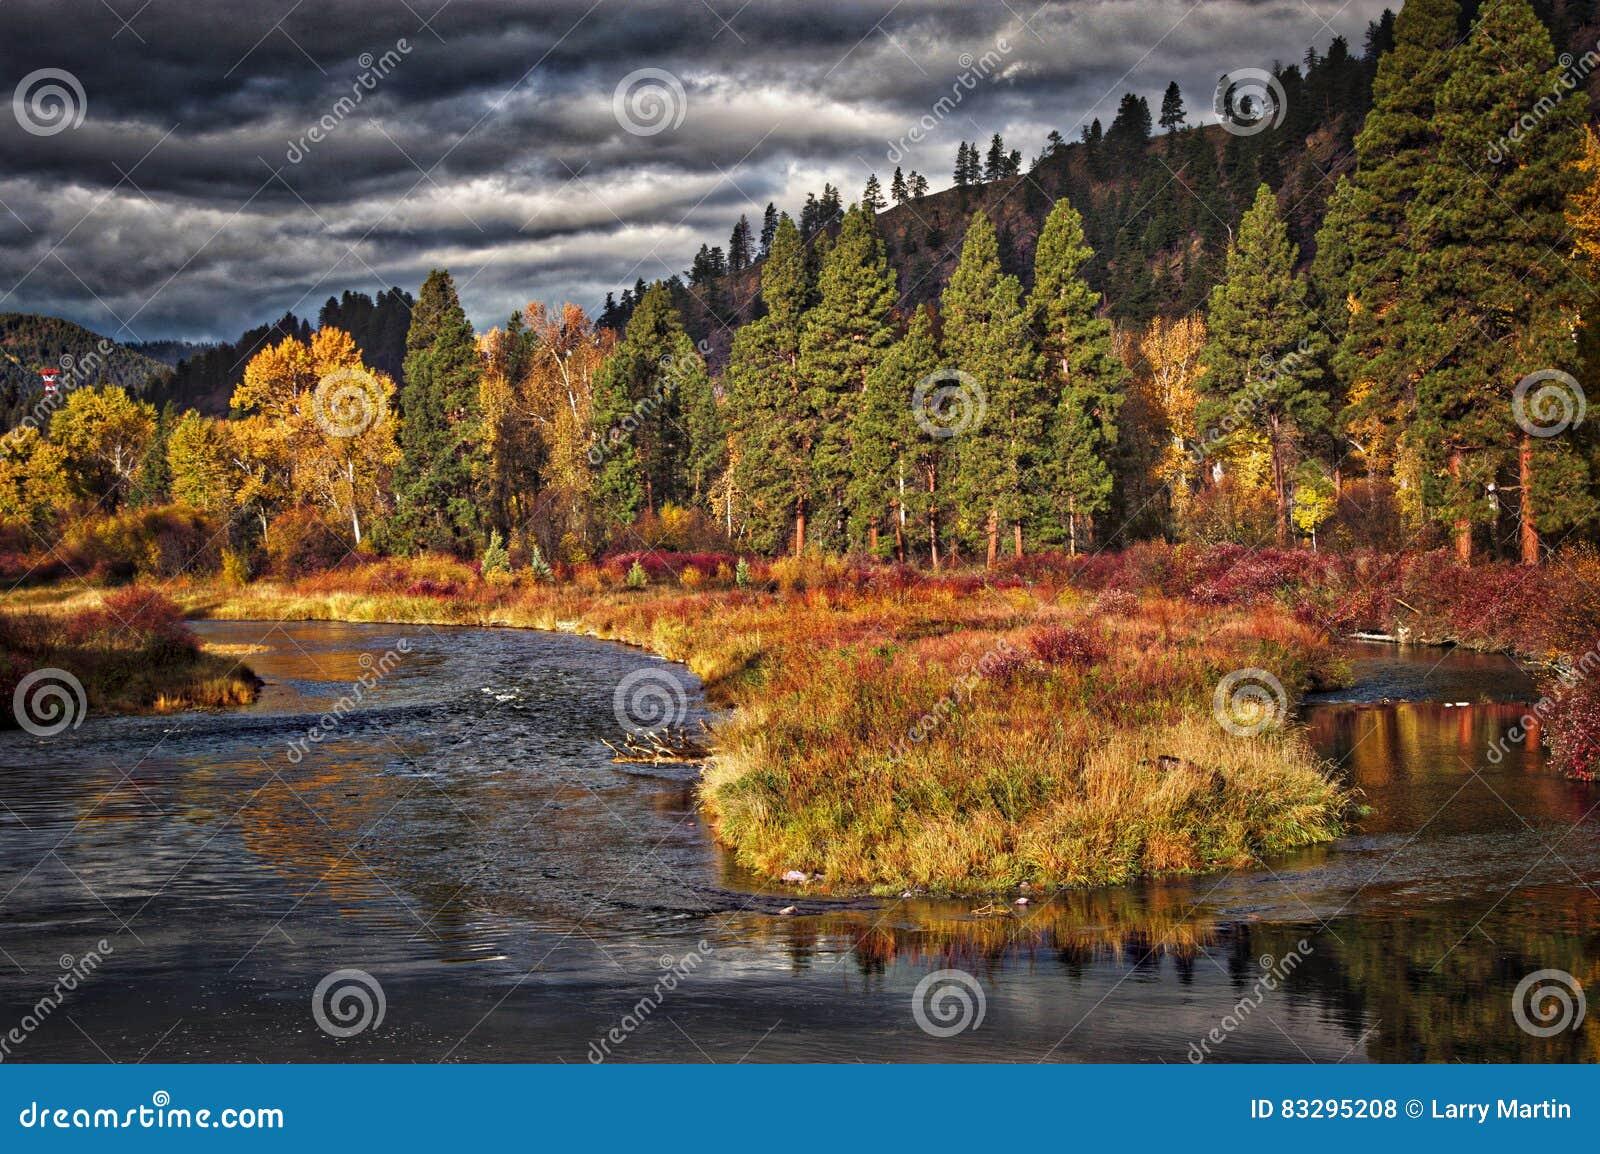 Clark Fork River Near Bearmouth, Montana Stock Photo